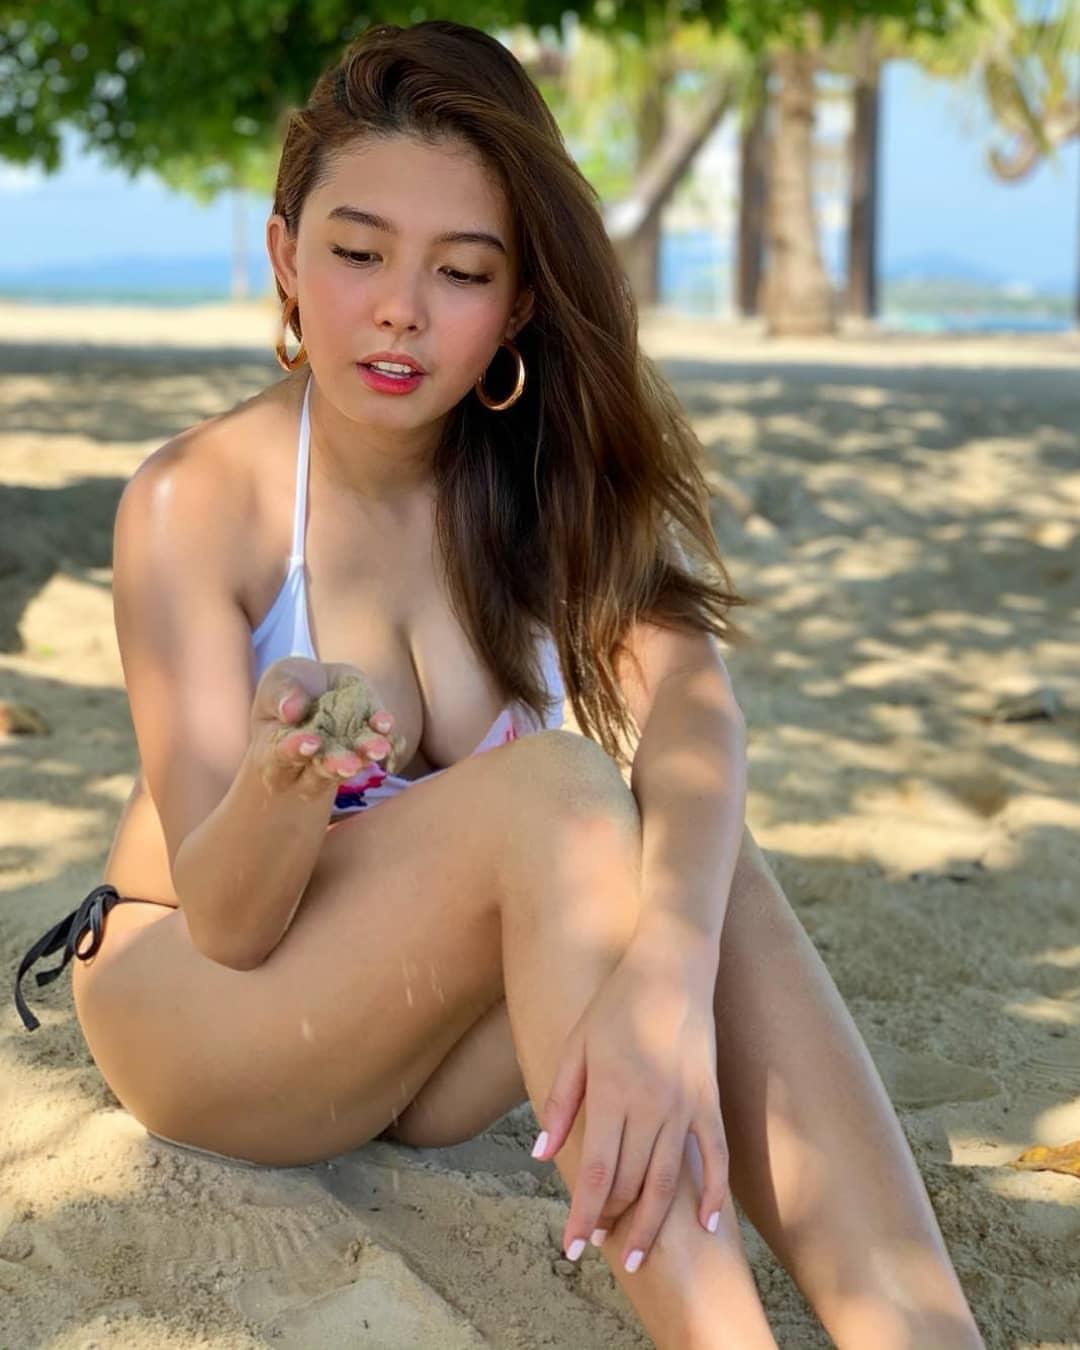 analyn barro sexy bikini pics 05